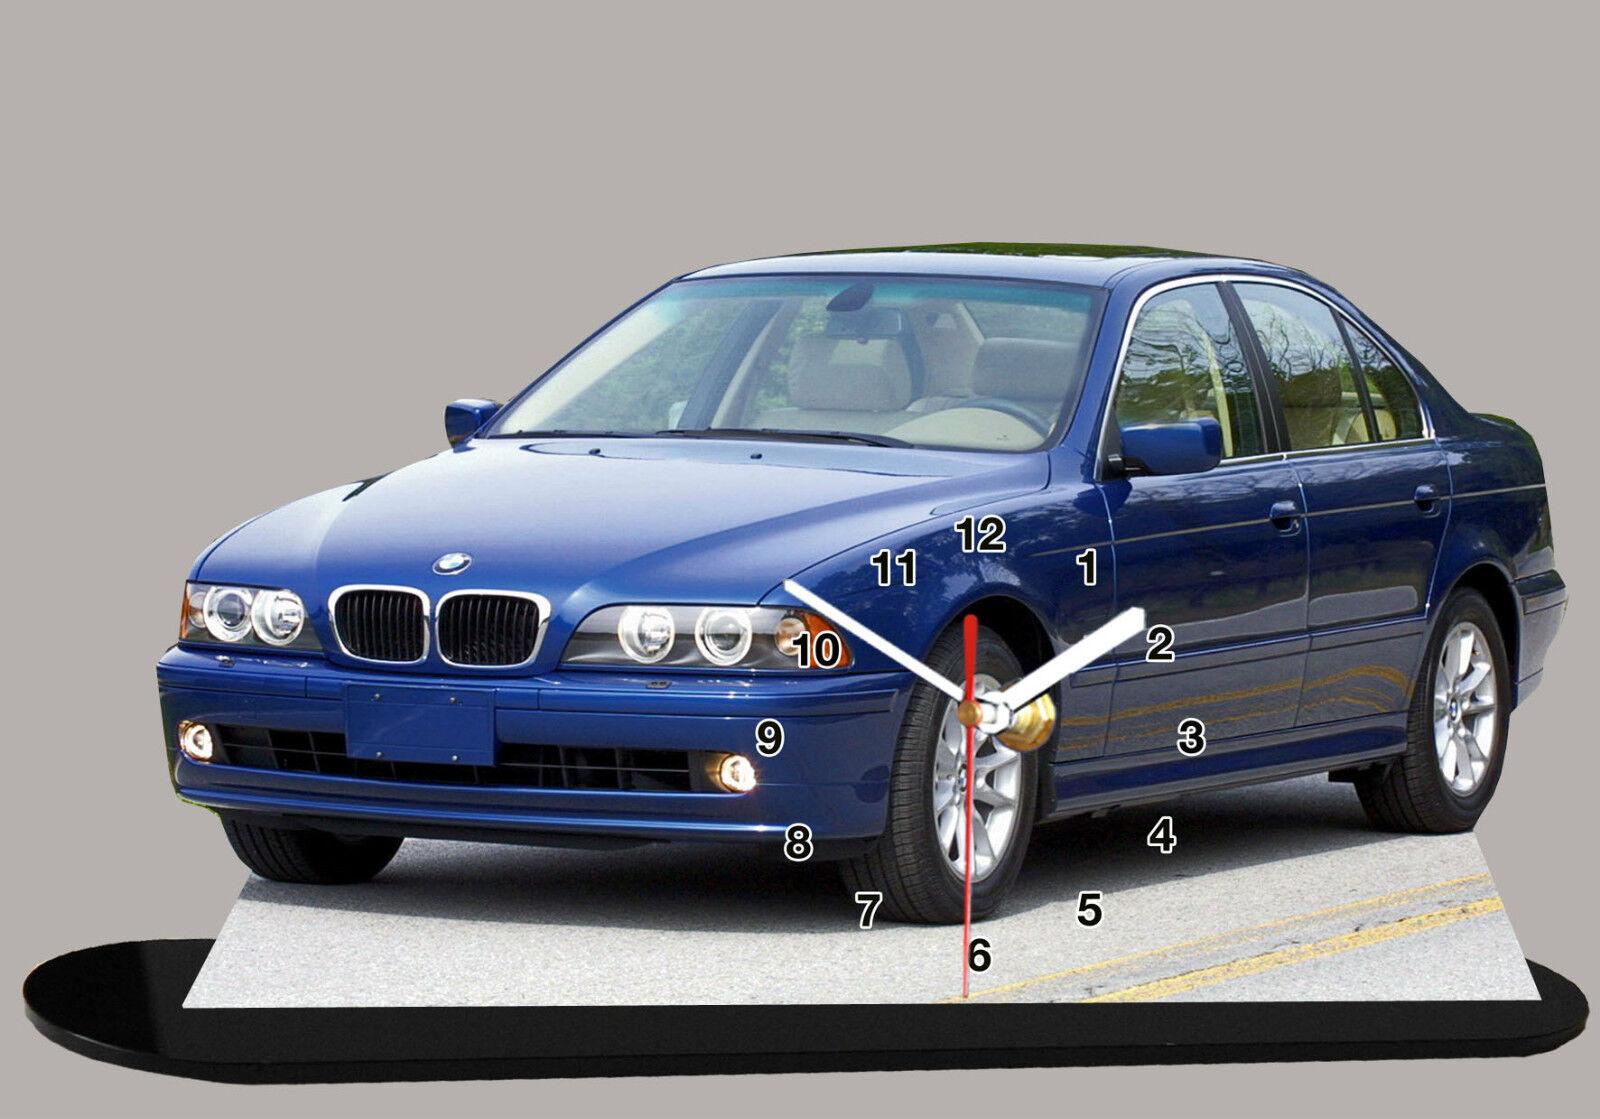 BMW 5 E39 -01, -01, -01, MINIATUR MODELLAUTOS in der Uhr e6957f